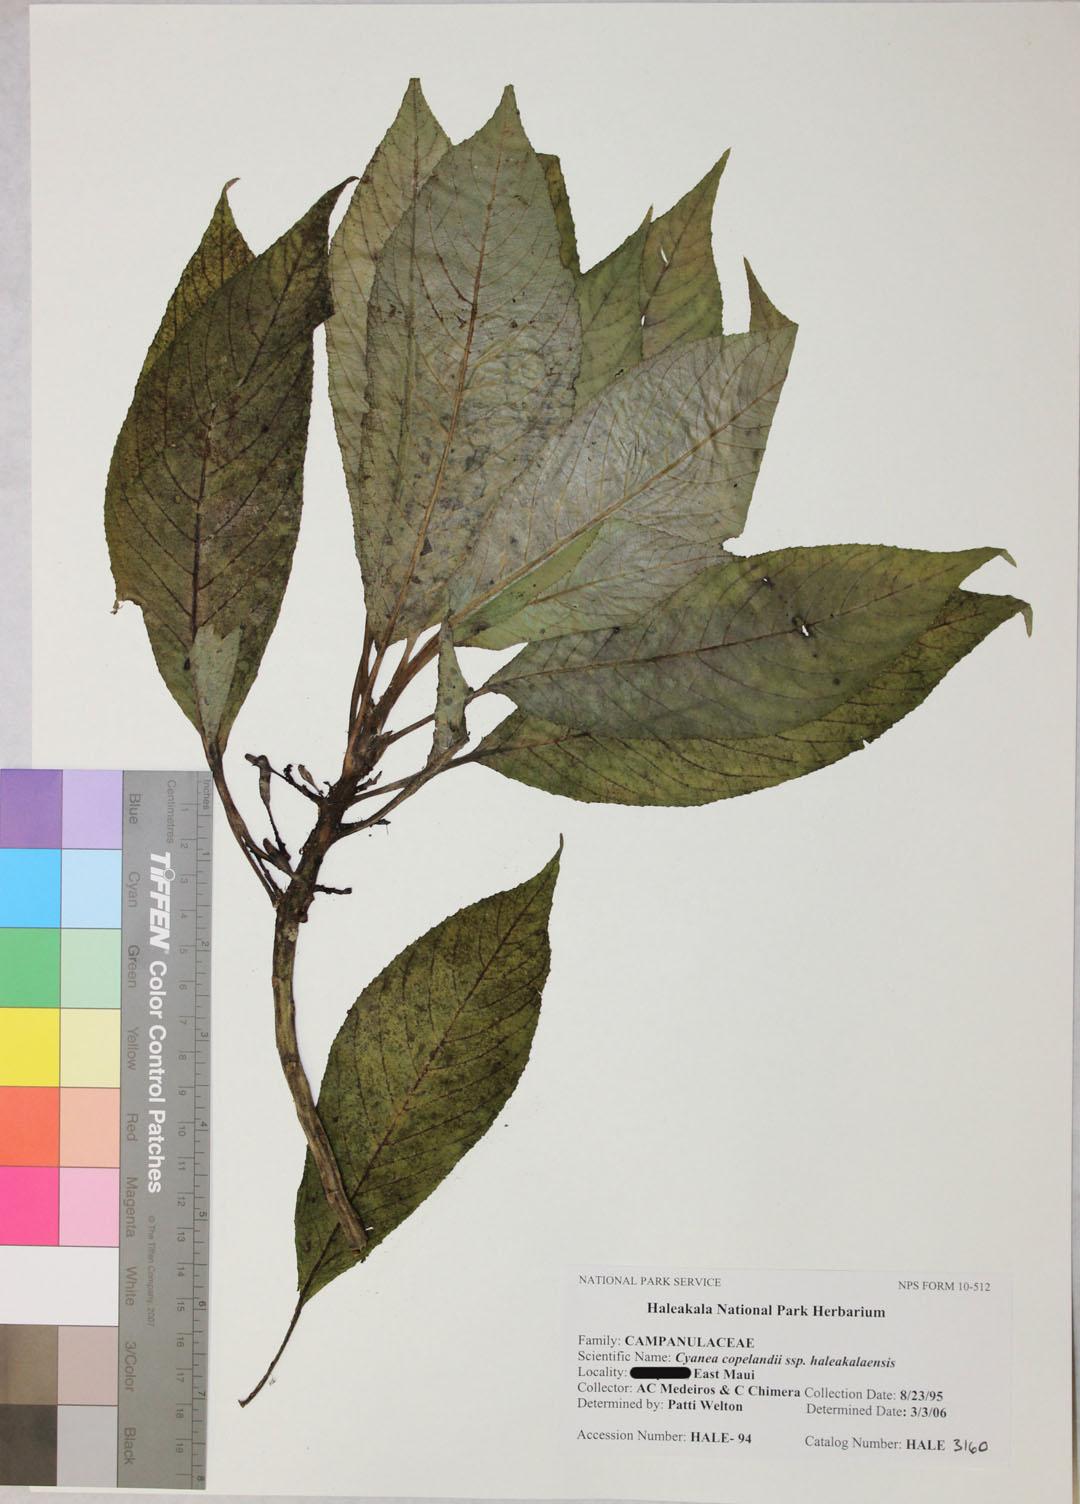 cyanea copelandii ssp haleakalaensis